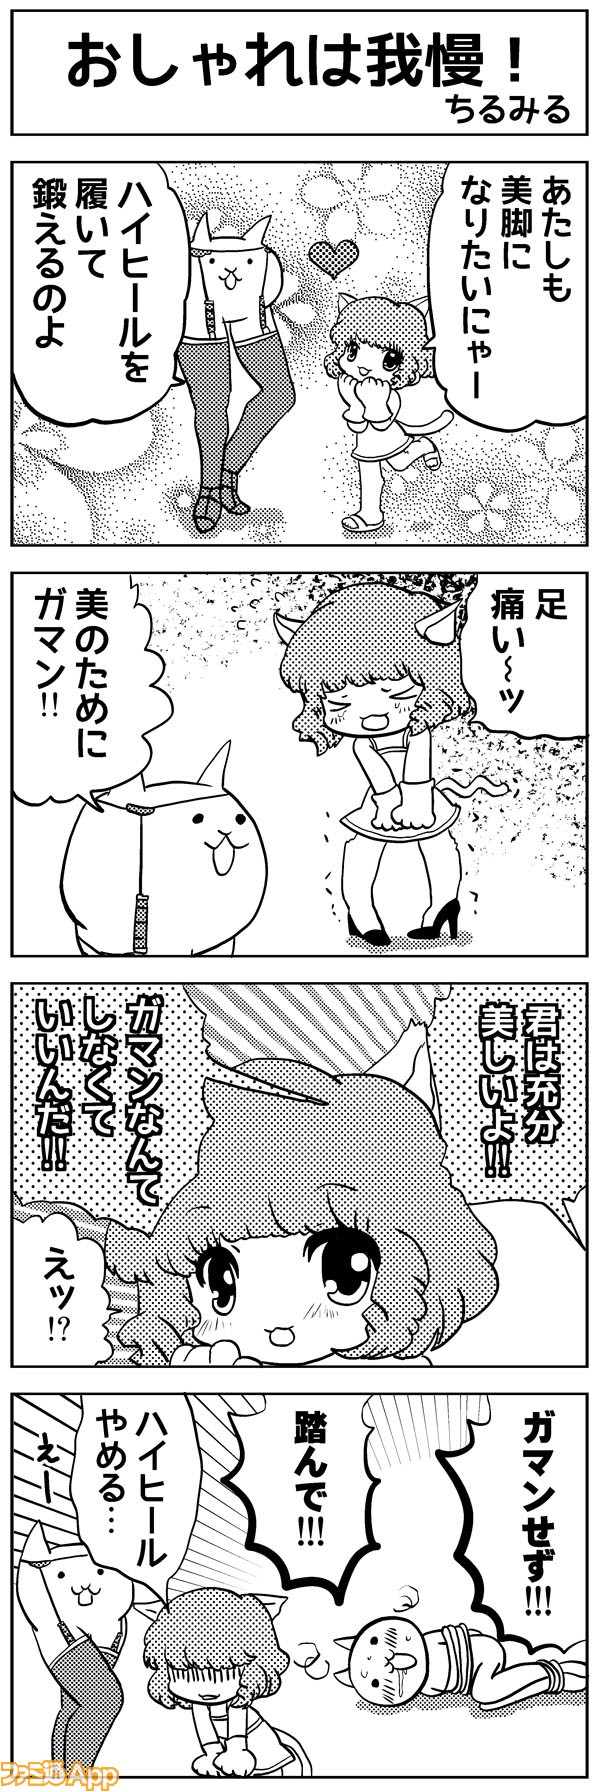 12chiru_006